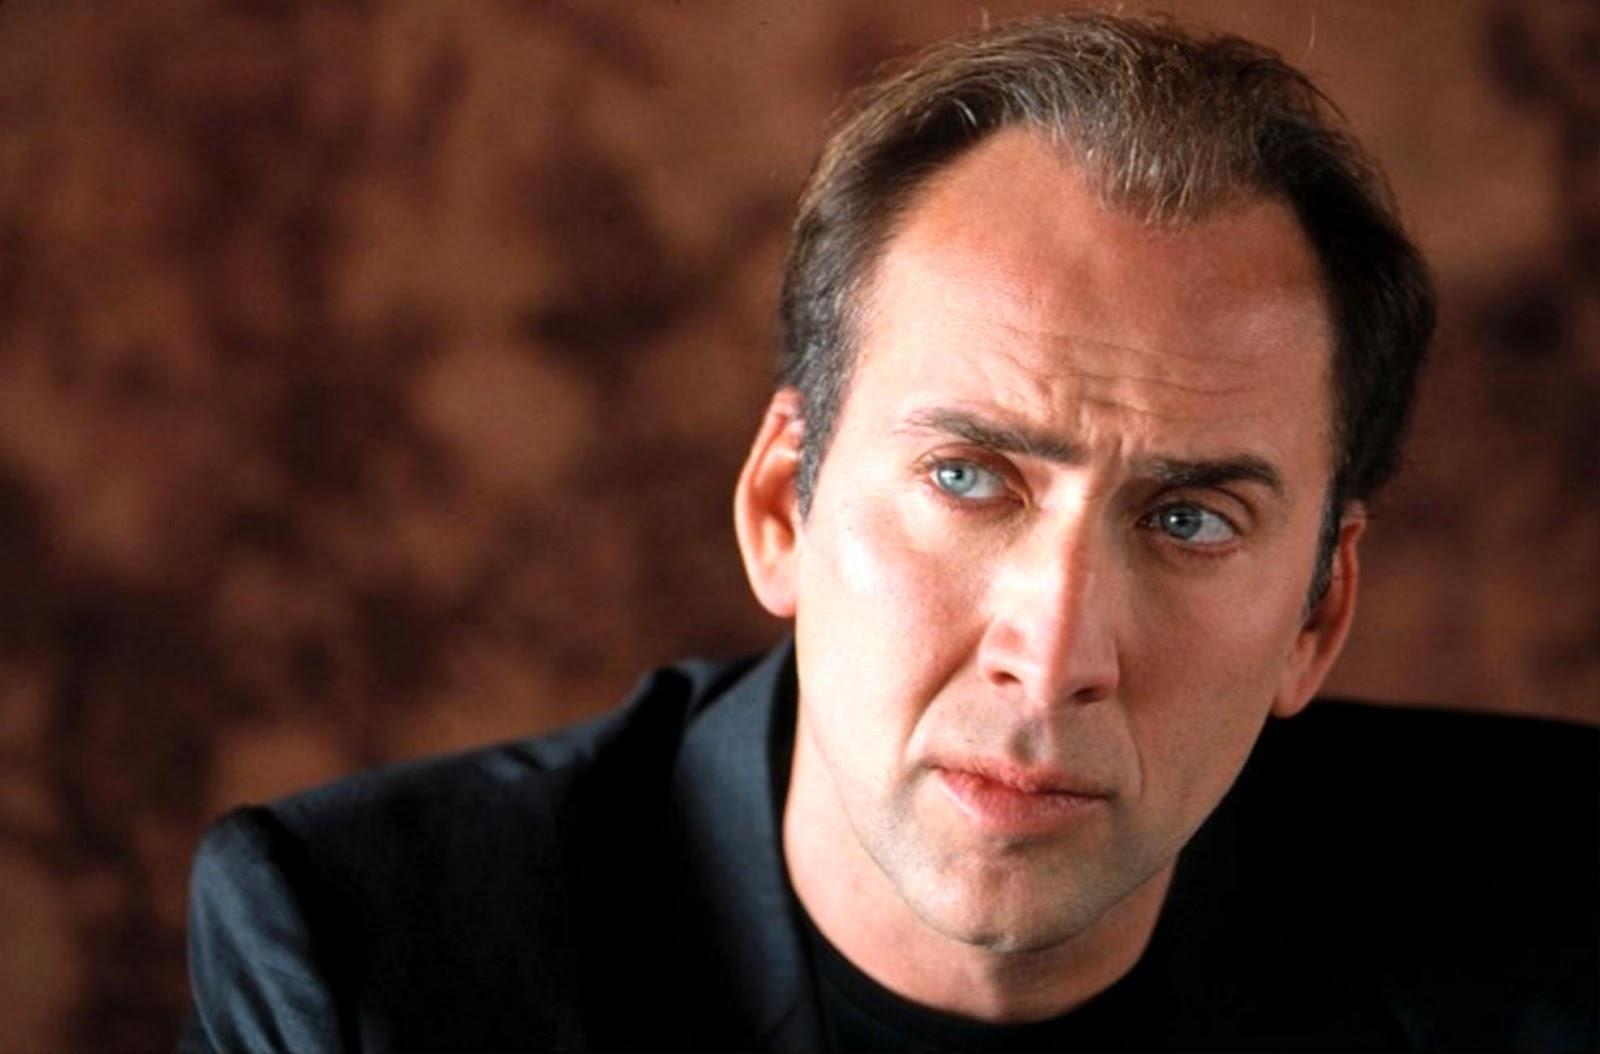 Nicolas Cage nicolas cage 26969958 1974 1300jpg 1600x1054